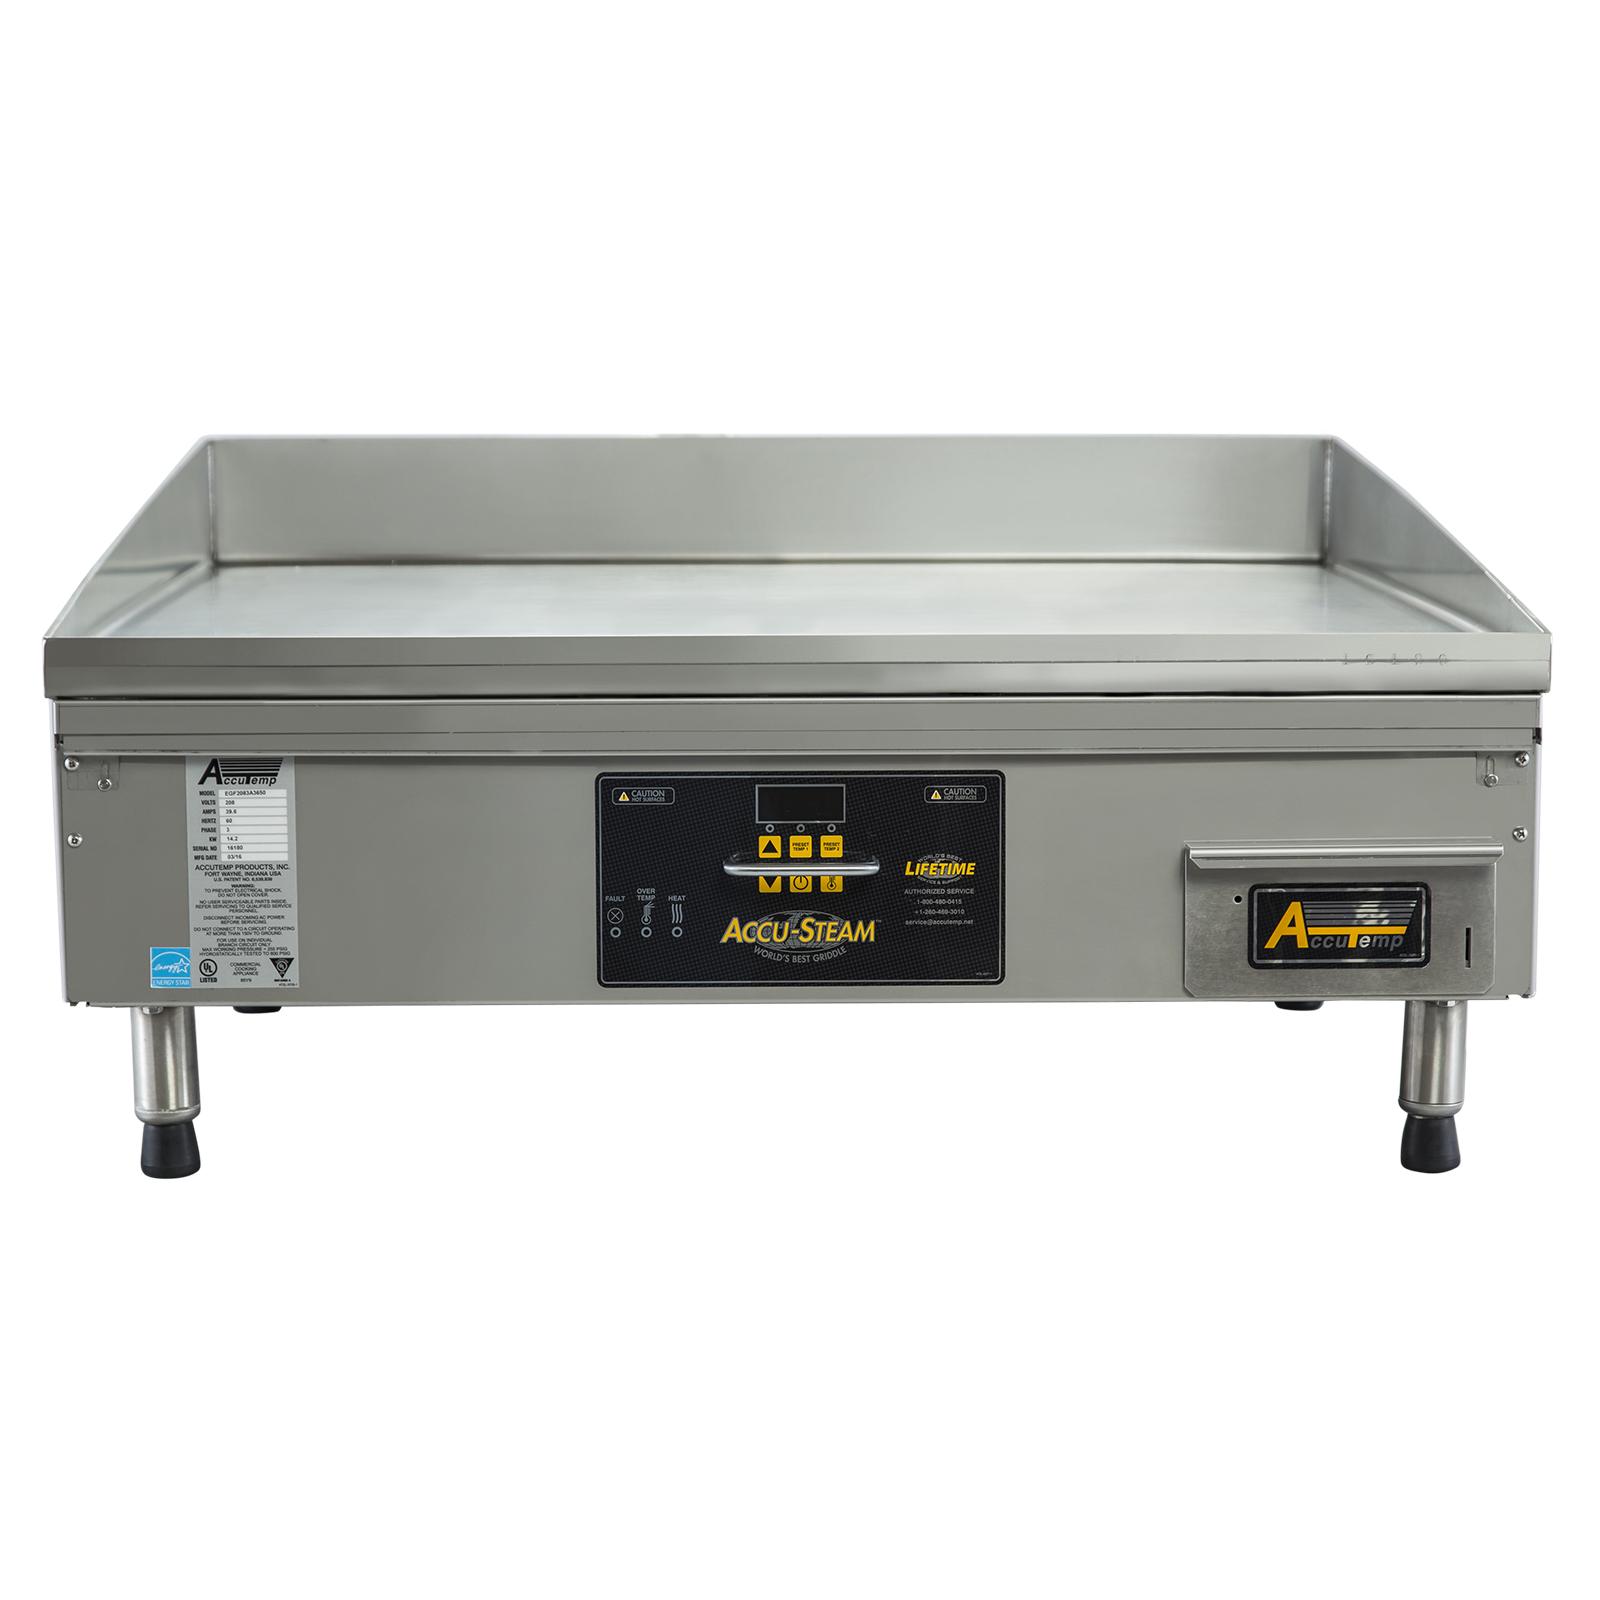 AccuTemp EGF2403A4850-T1 griddle, electric, countertop